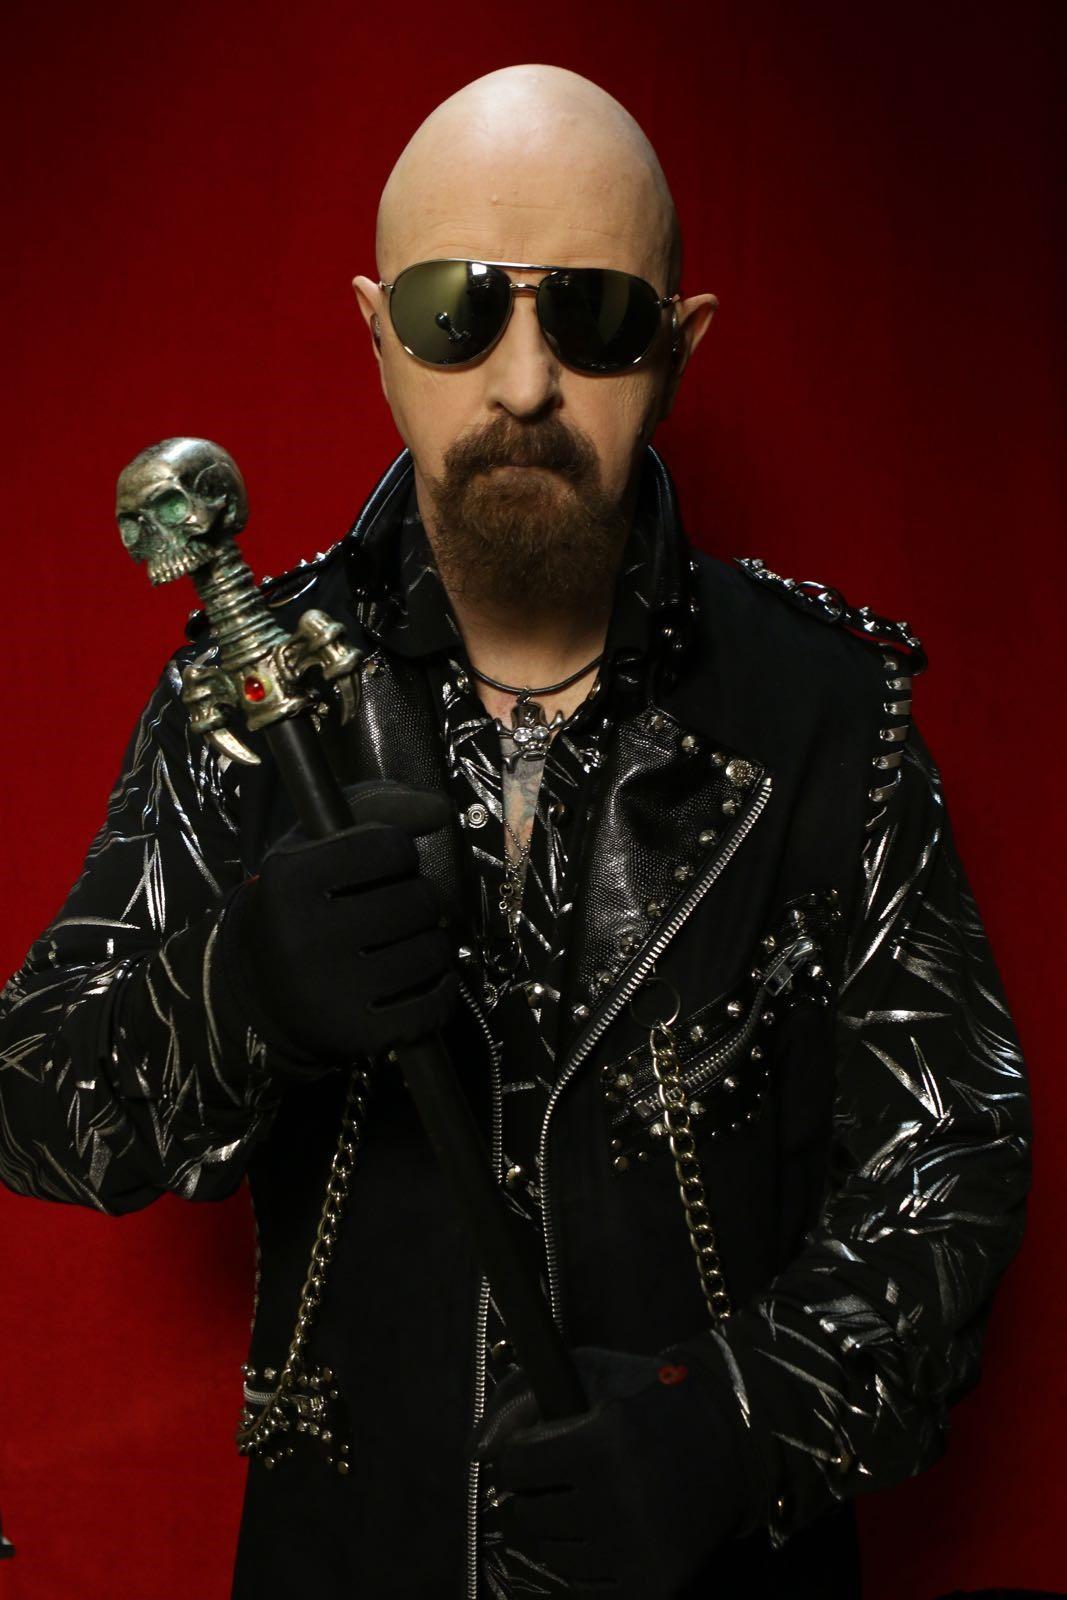 Rob_Halford_Judas_Priest_Hard_Rock_Heavy_Metal